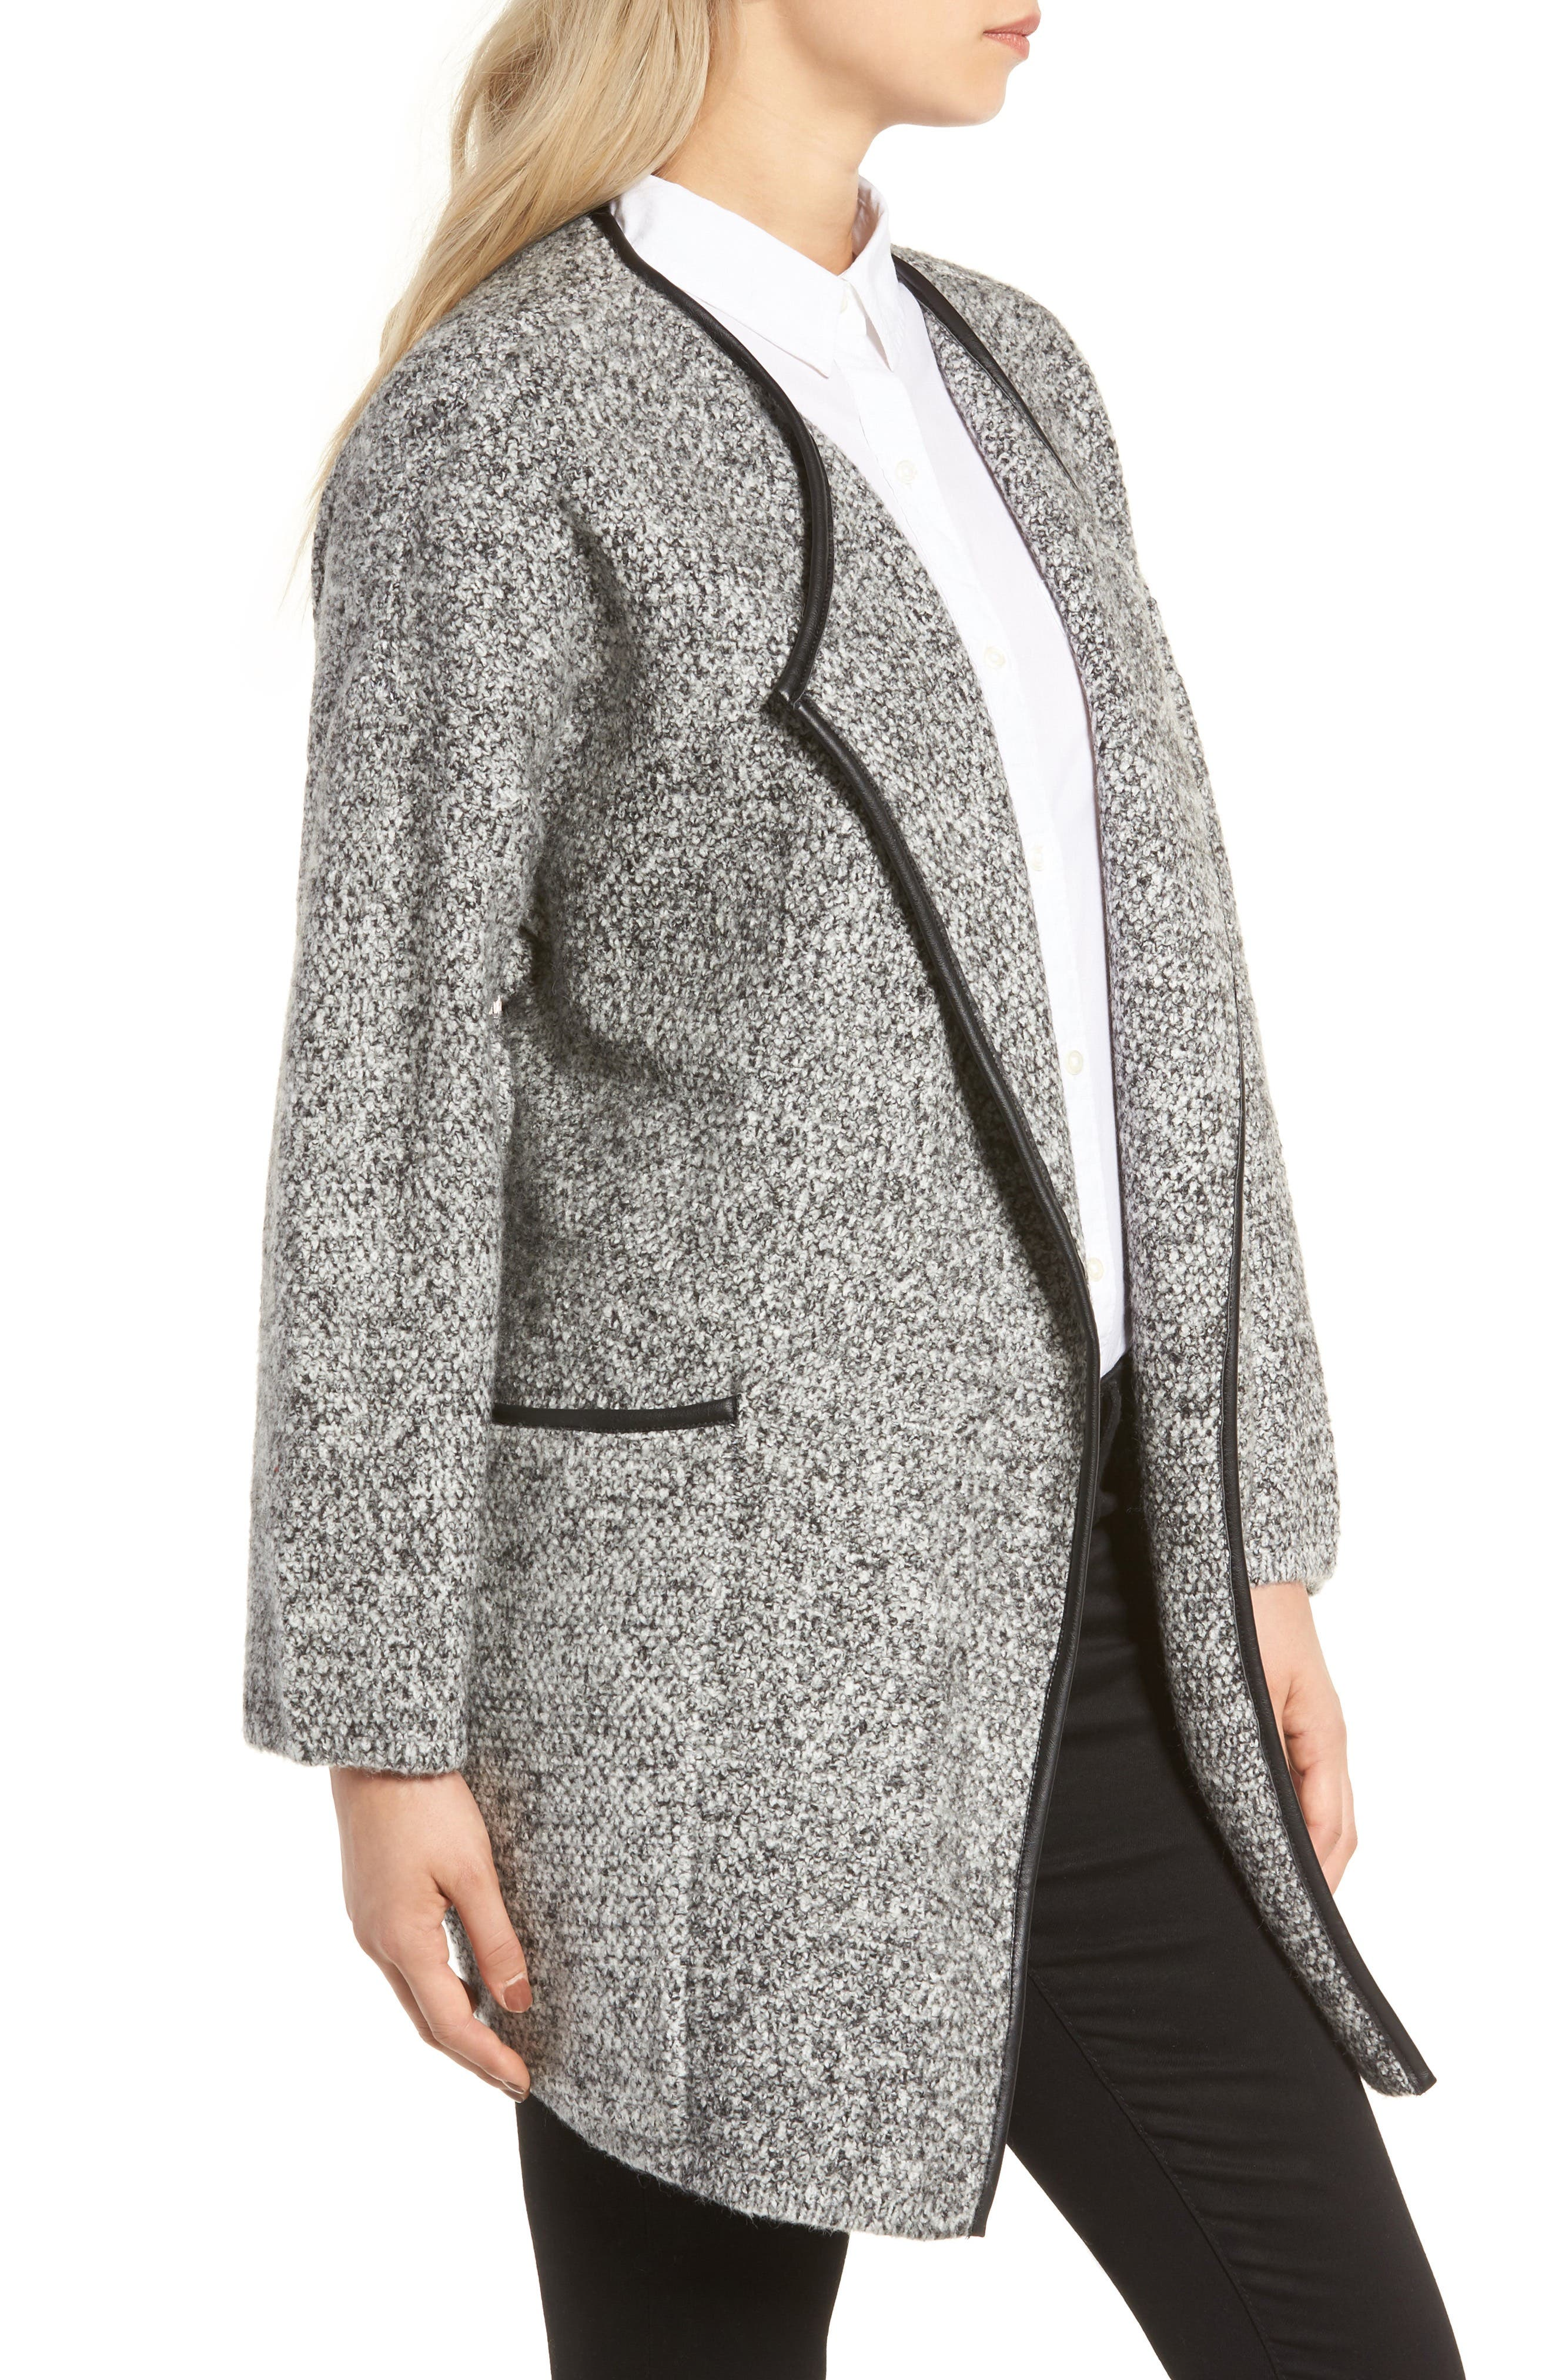 ASTR THE LABEL,                             ASTR Drape Front Sweater Jacket,                             Alternate thumbnail 3, color,                             001